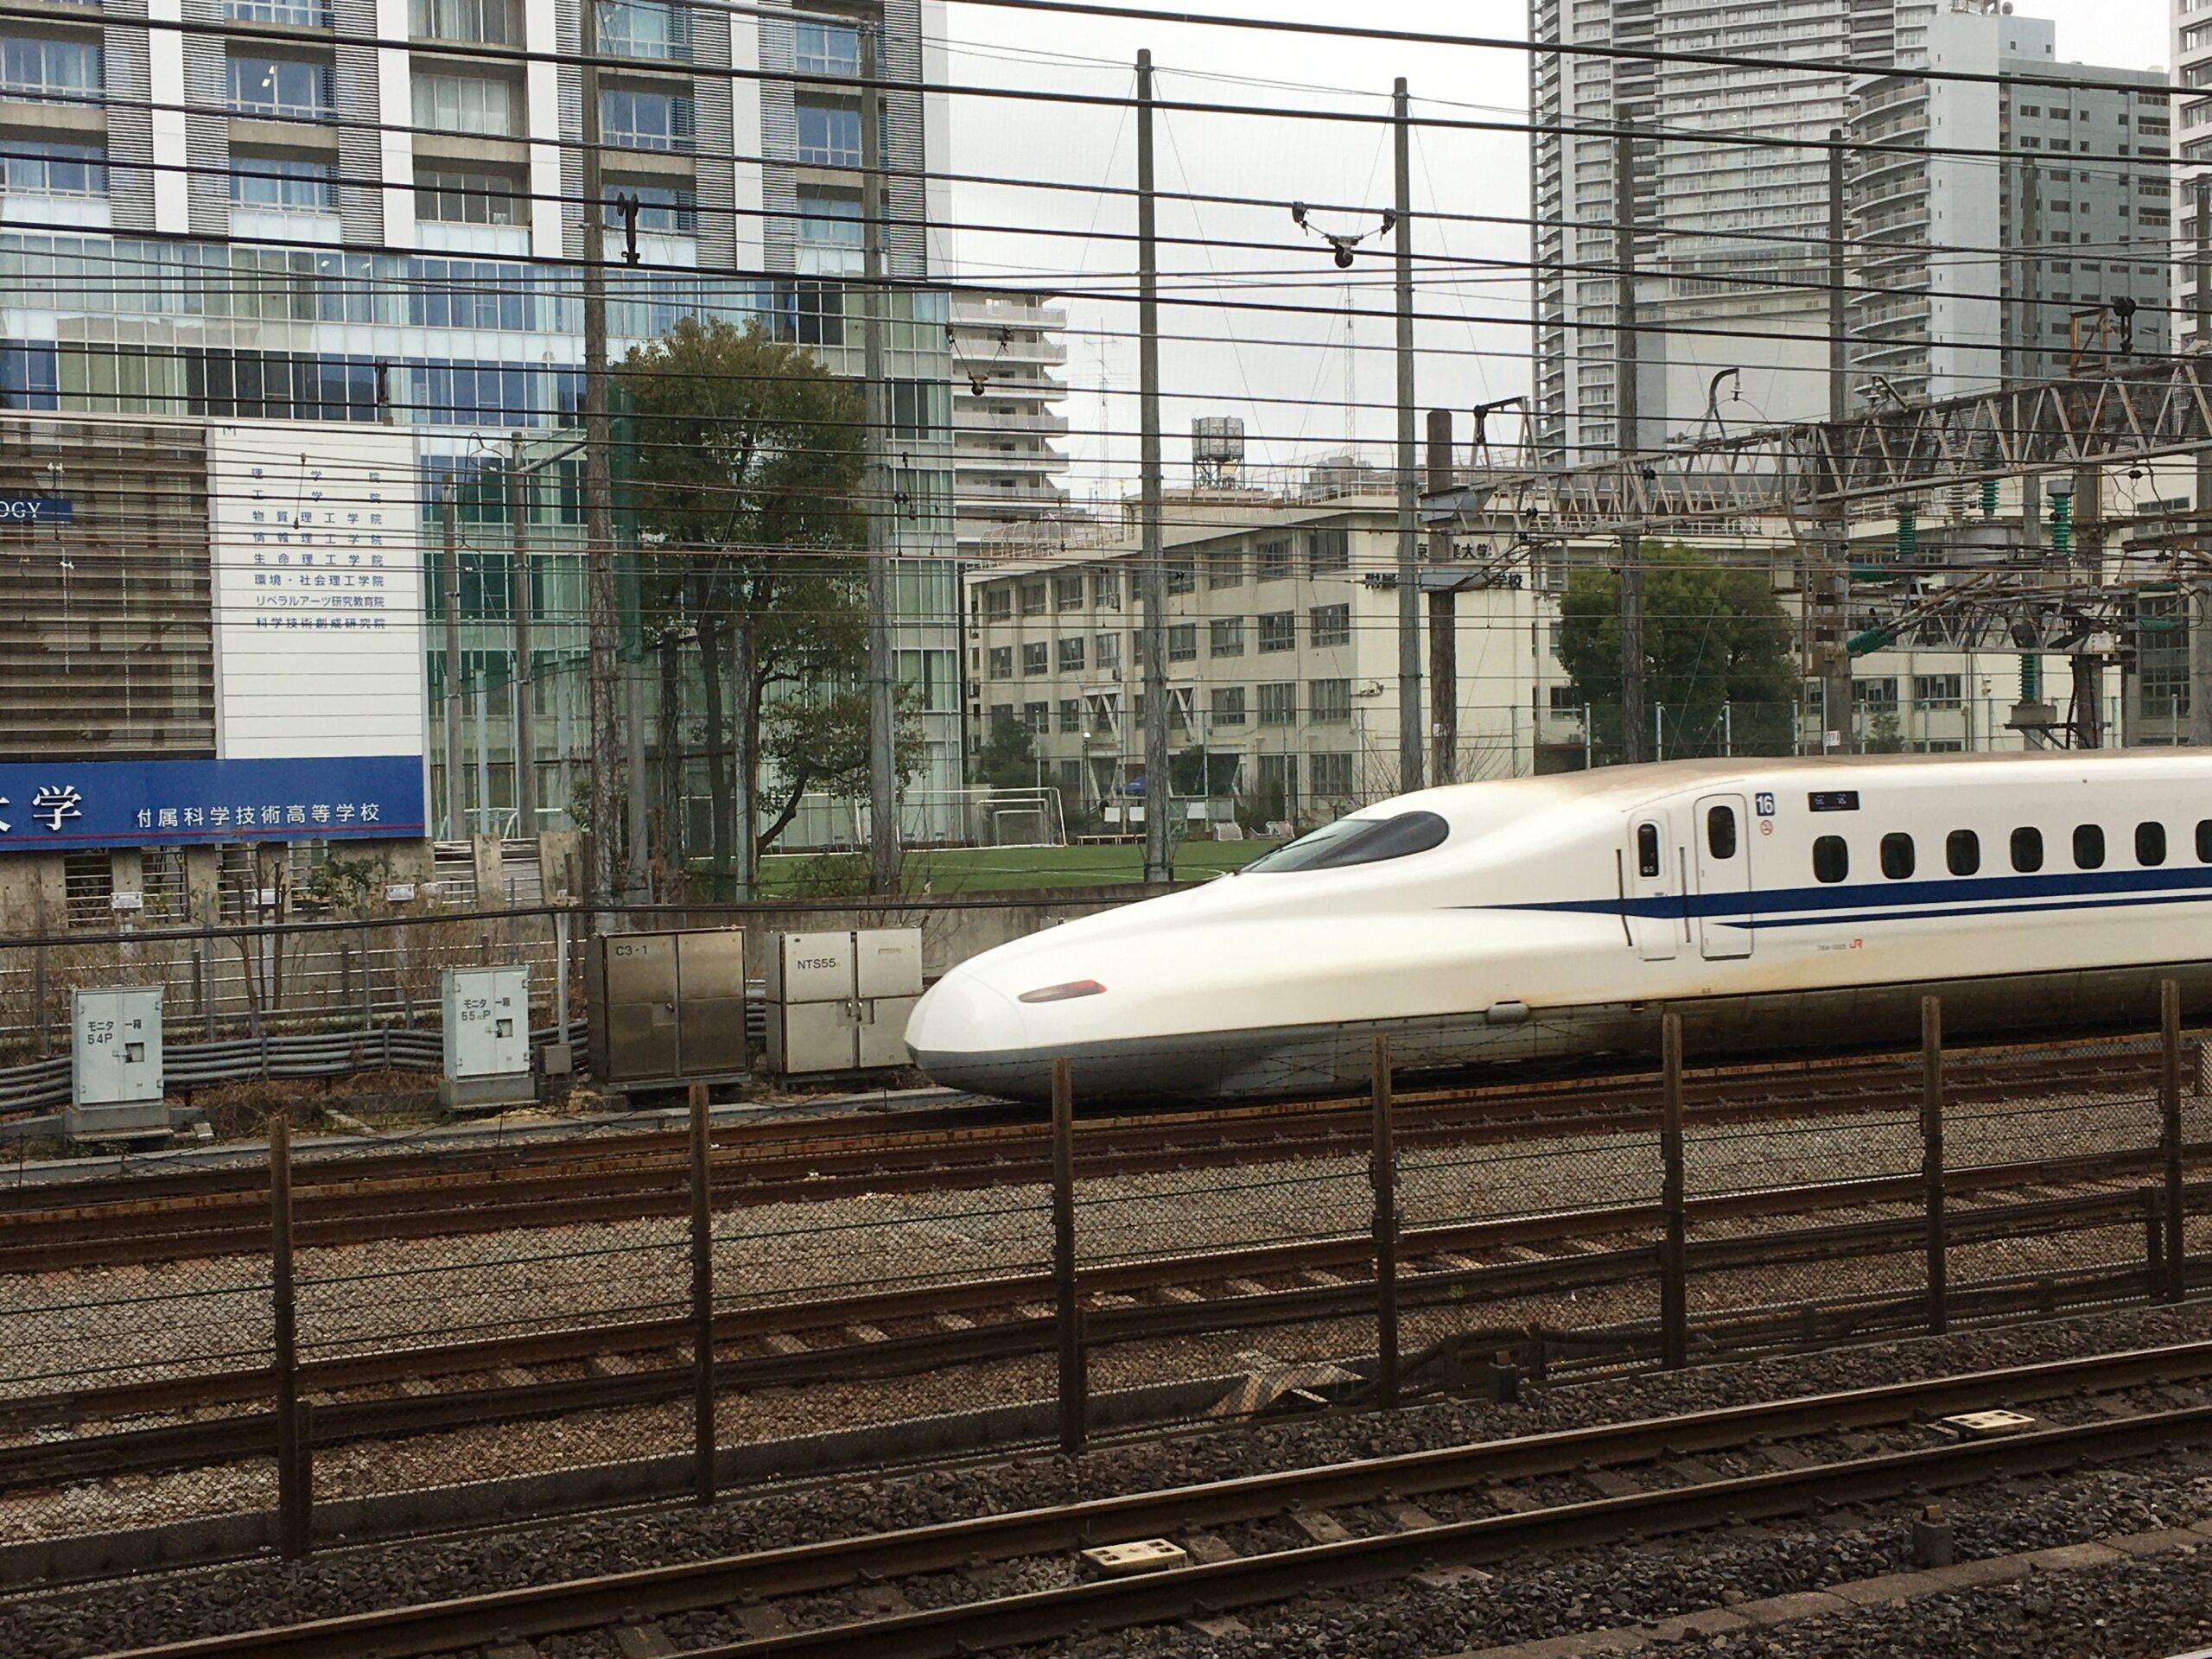 JR田町駅前で大規模開発、東京工業大キャンパス活用ーNTT都市開発など4社